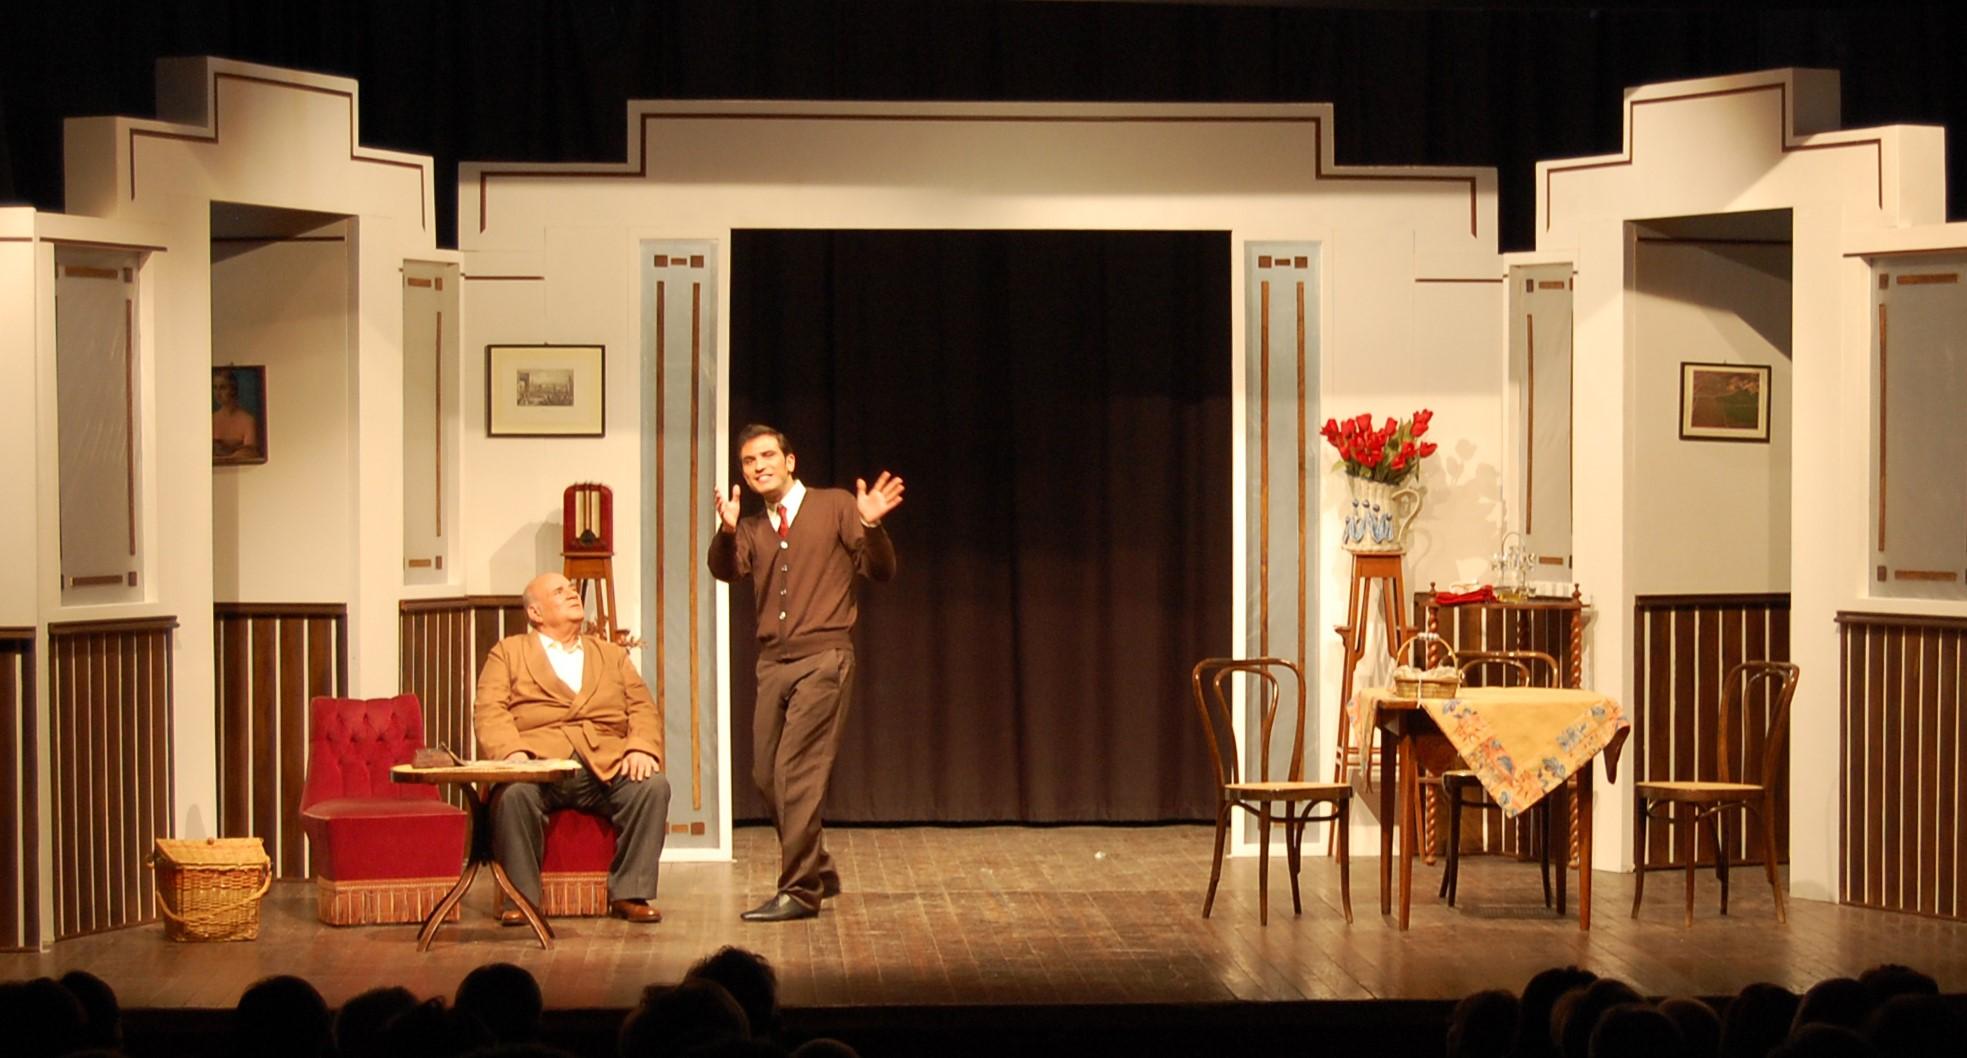 Teatro Amator